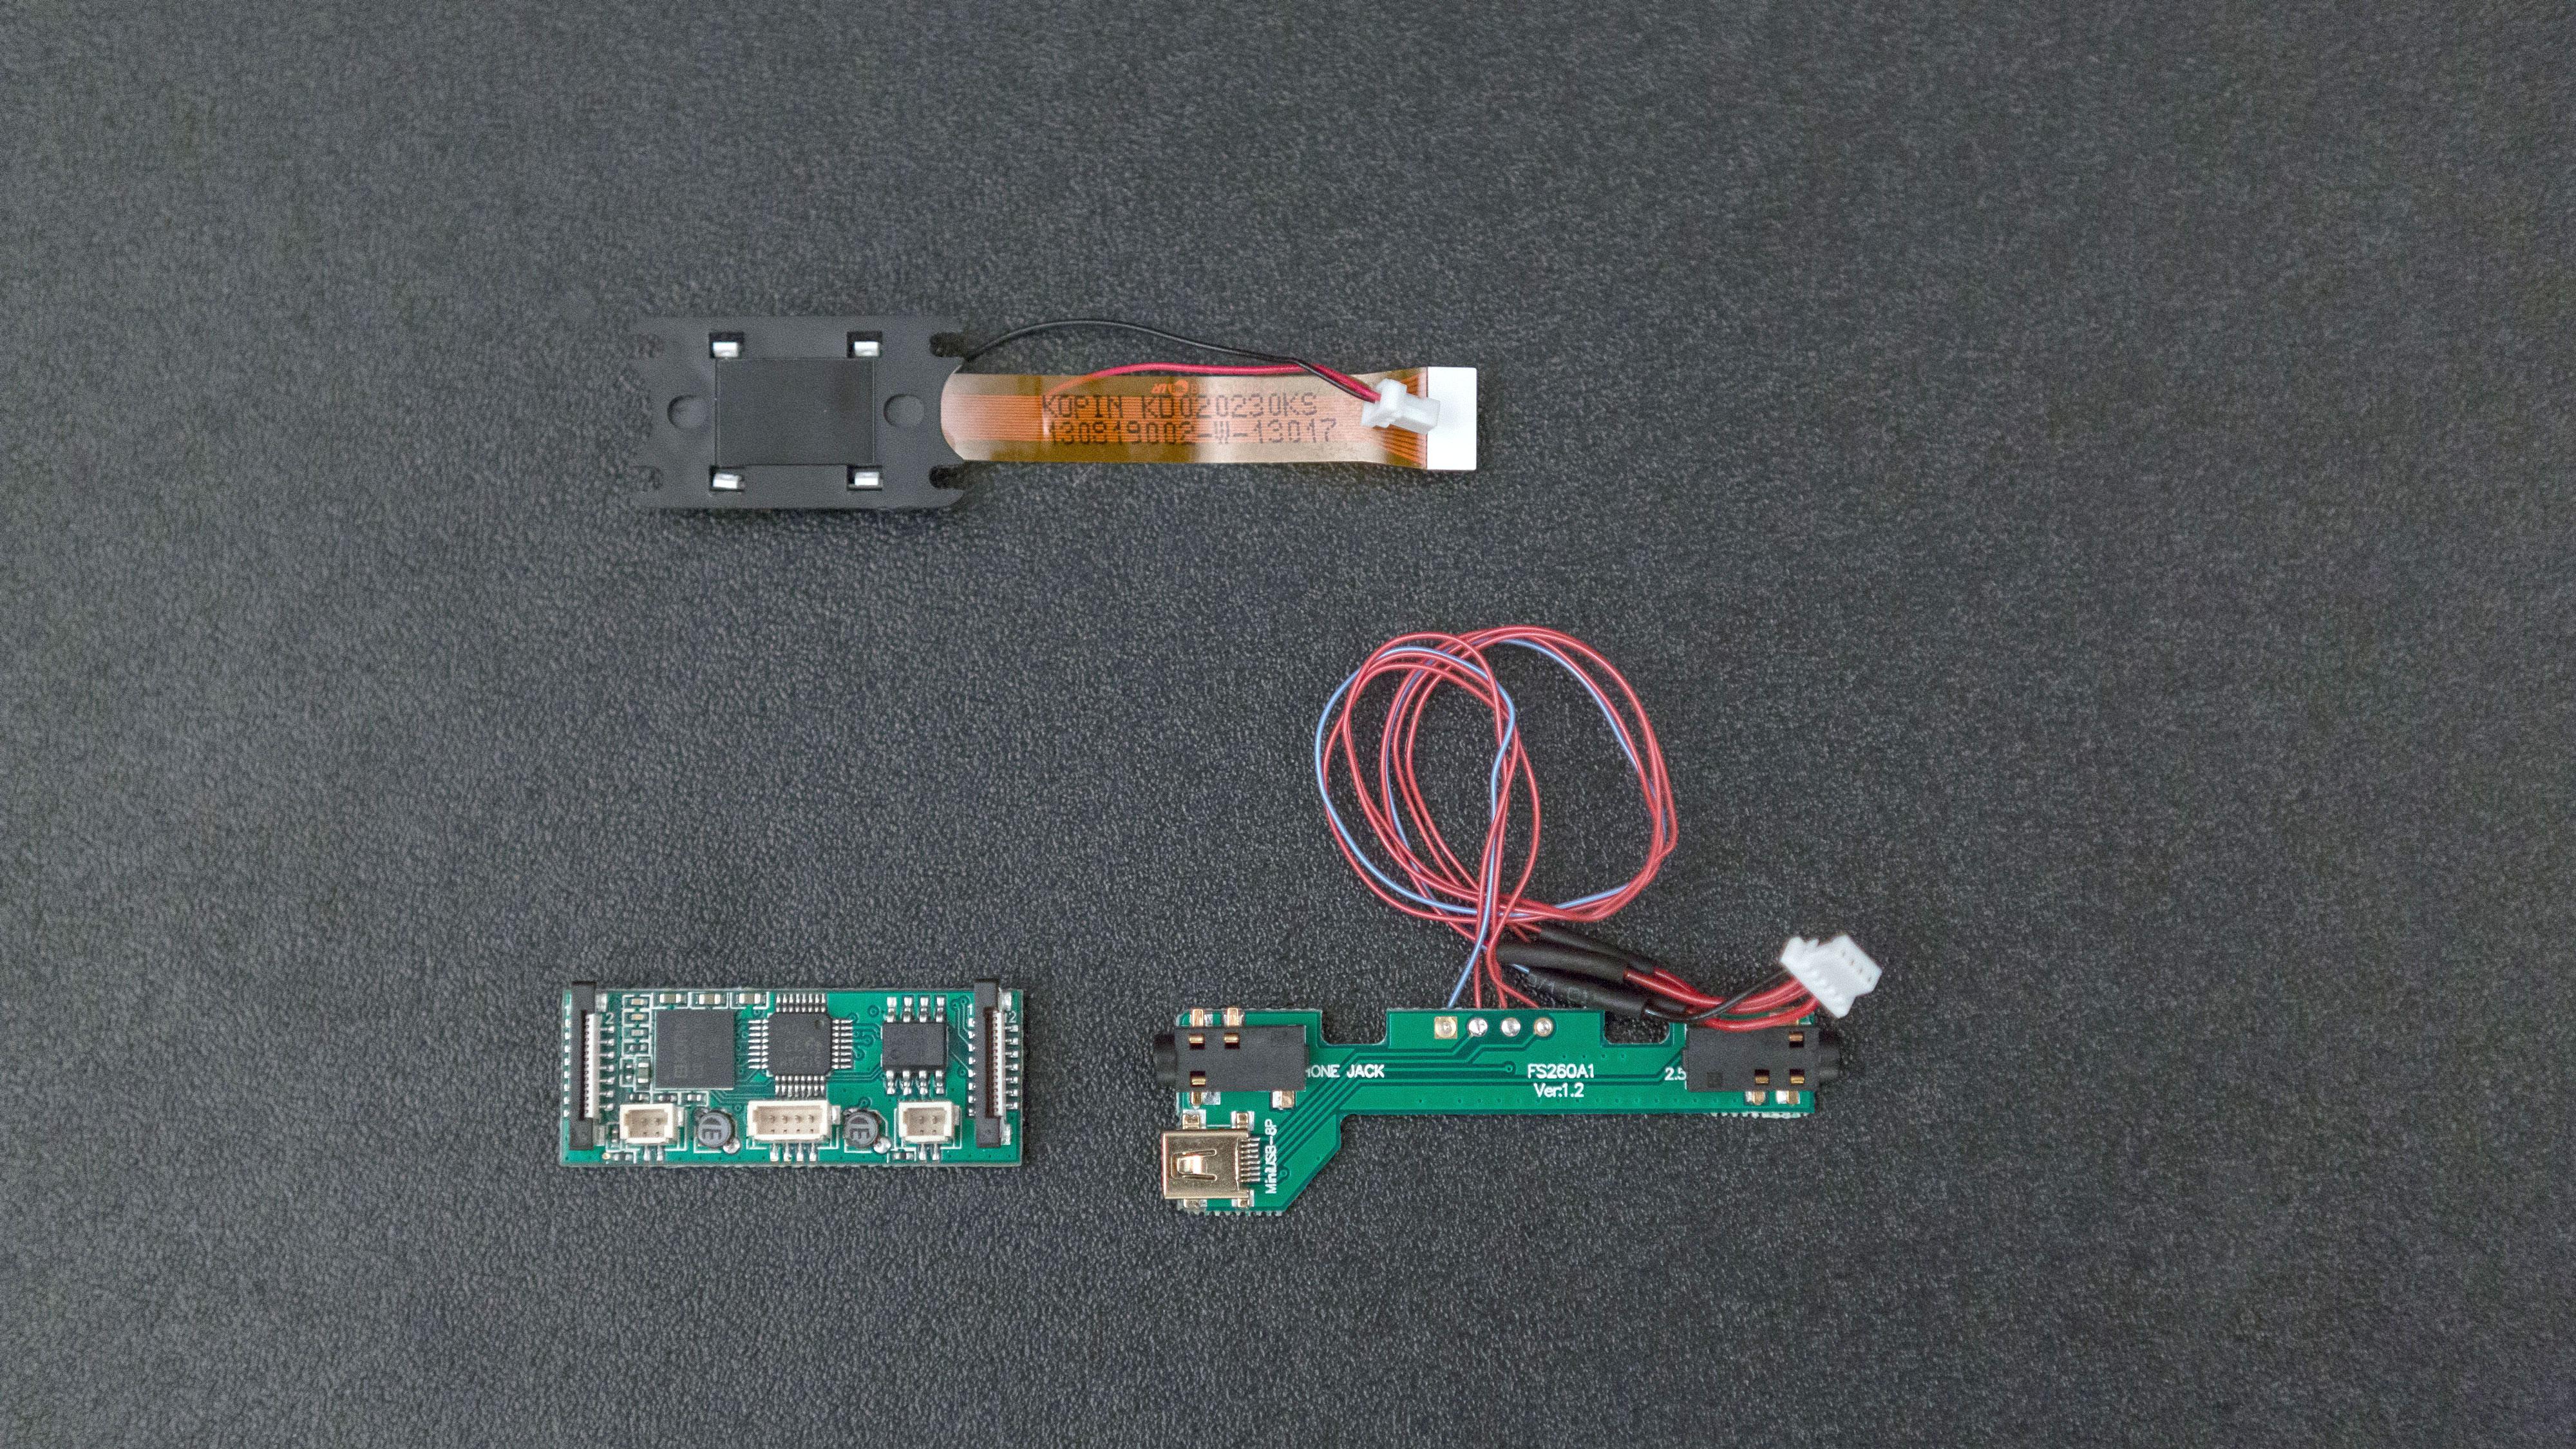 hacks_boards2.jpg